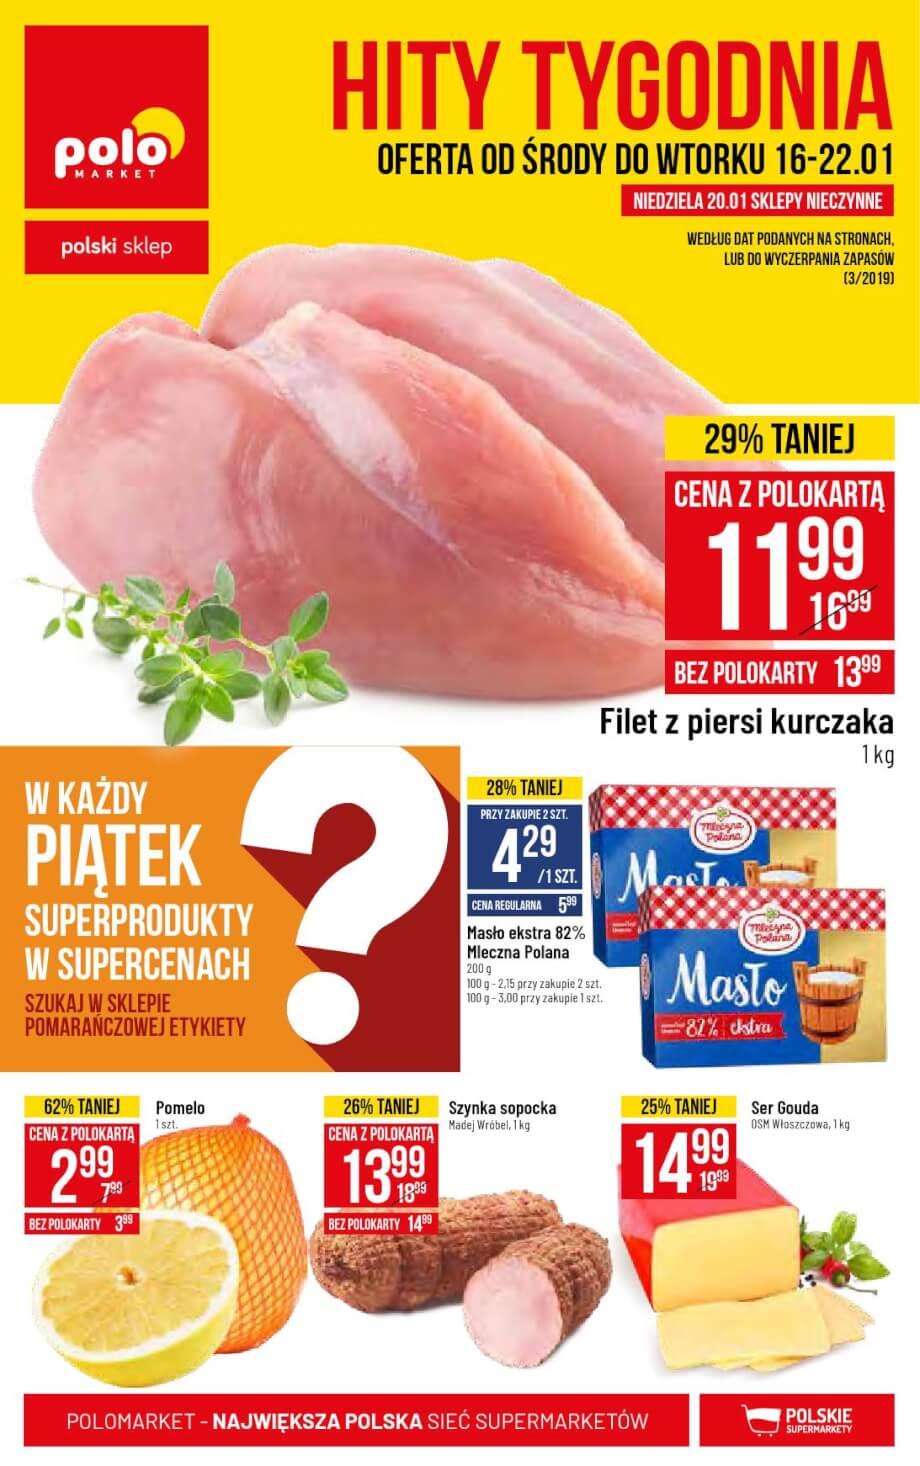 Polomarket, gazetka do 22.01.2019